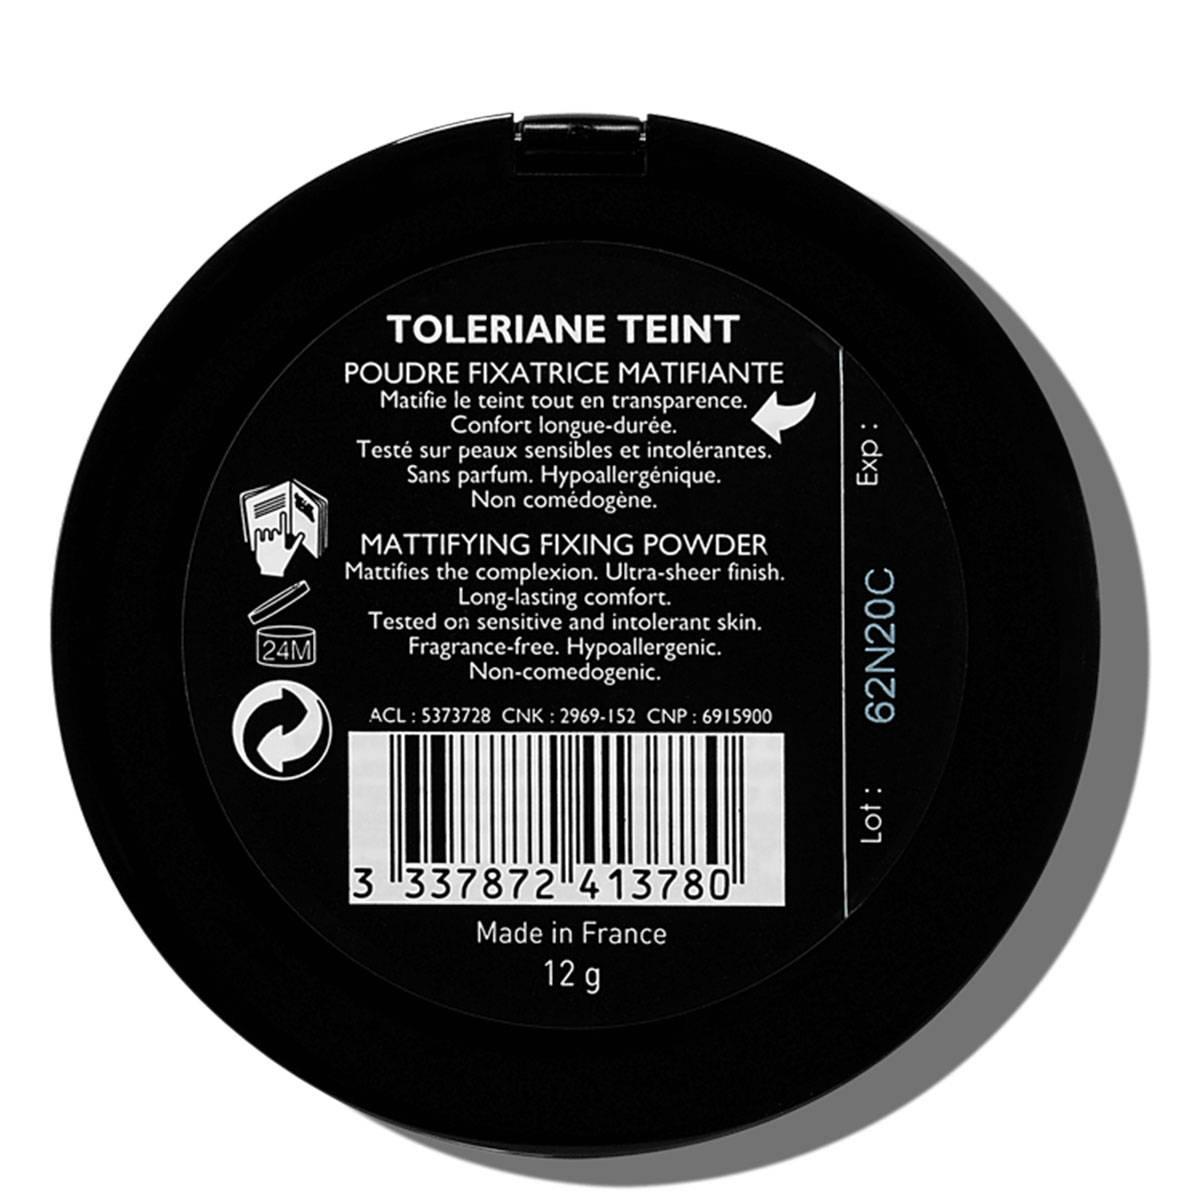 La Roche Posay Sensitive Toleriane Make up TEINT_Fixation 3337872413780